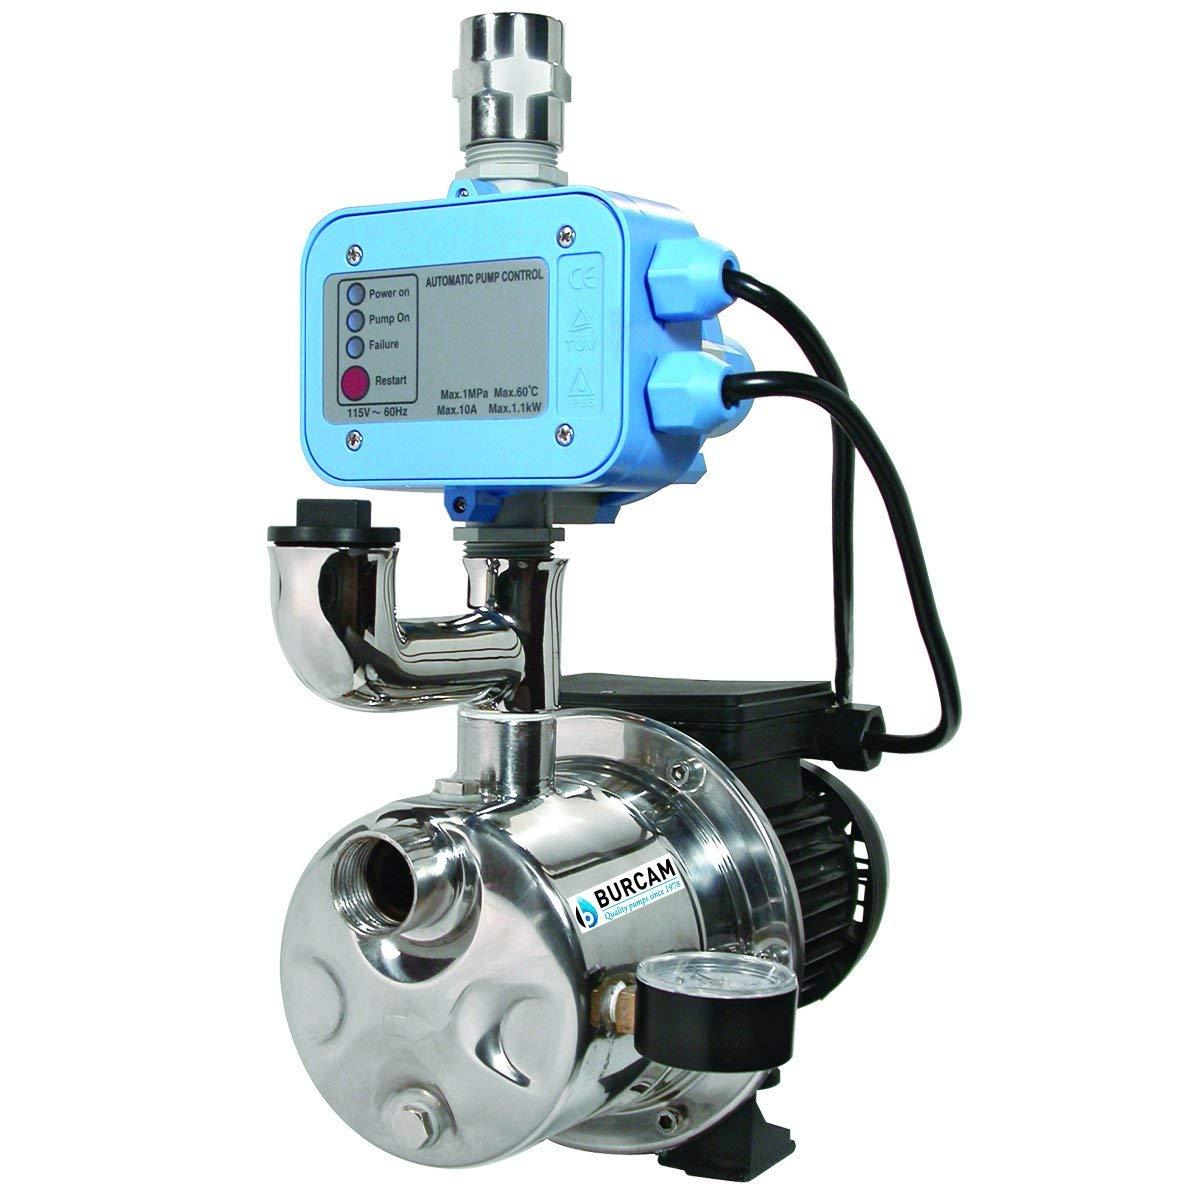 BurCam 506532SS Water Pressure Booster Pump